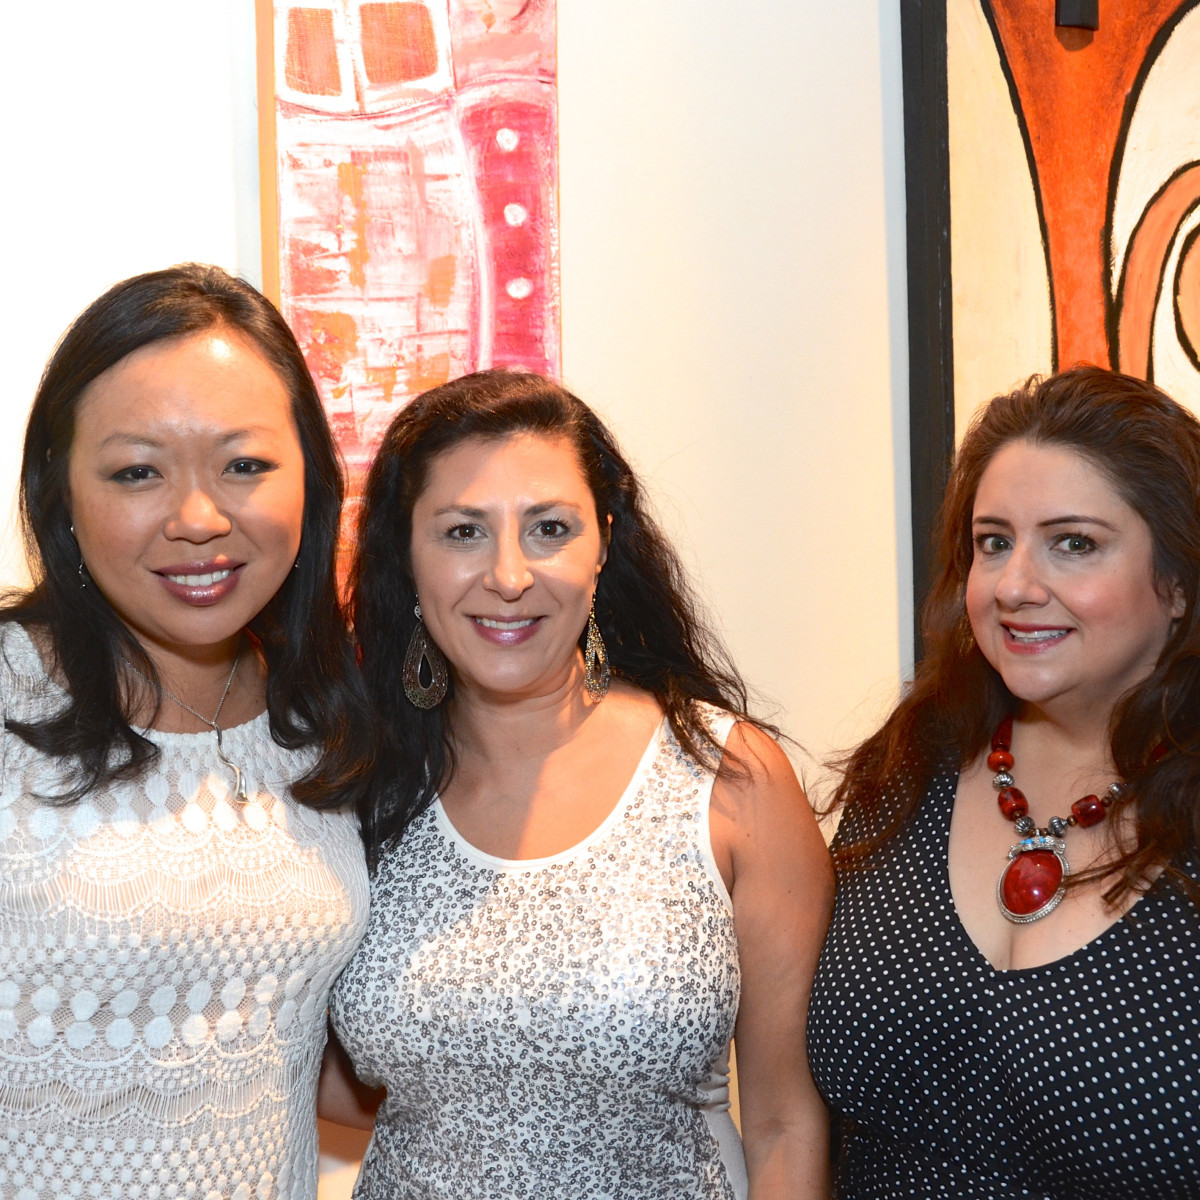 News, Shelby, Big Believer, June 2015, Miya Shay, Debbie Elias, Sonia Soto